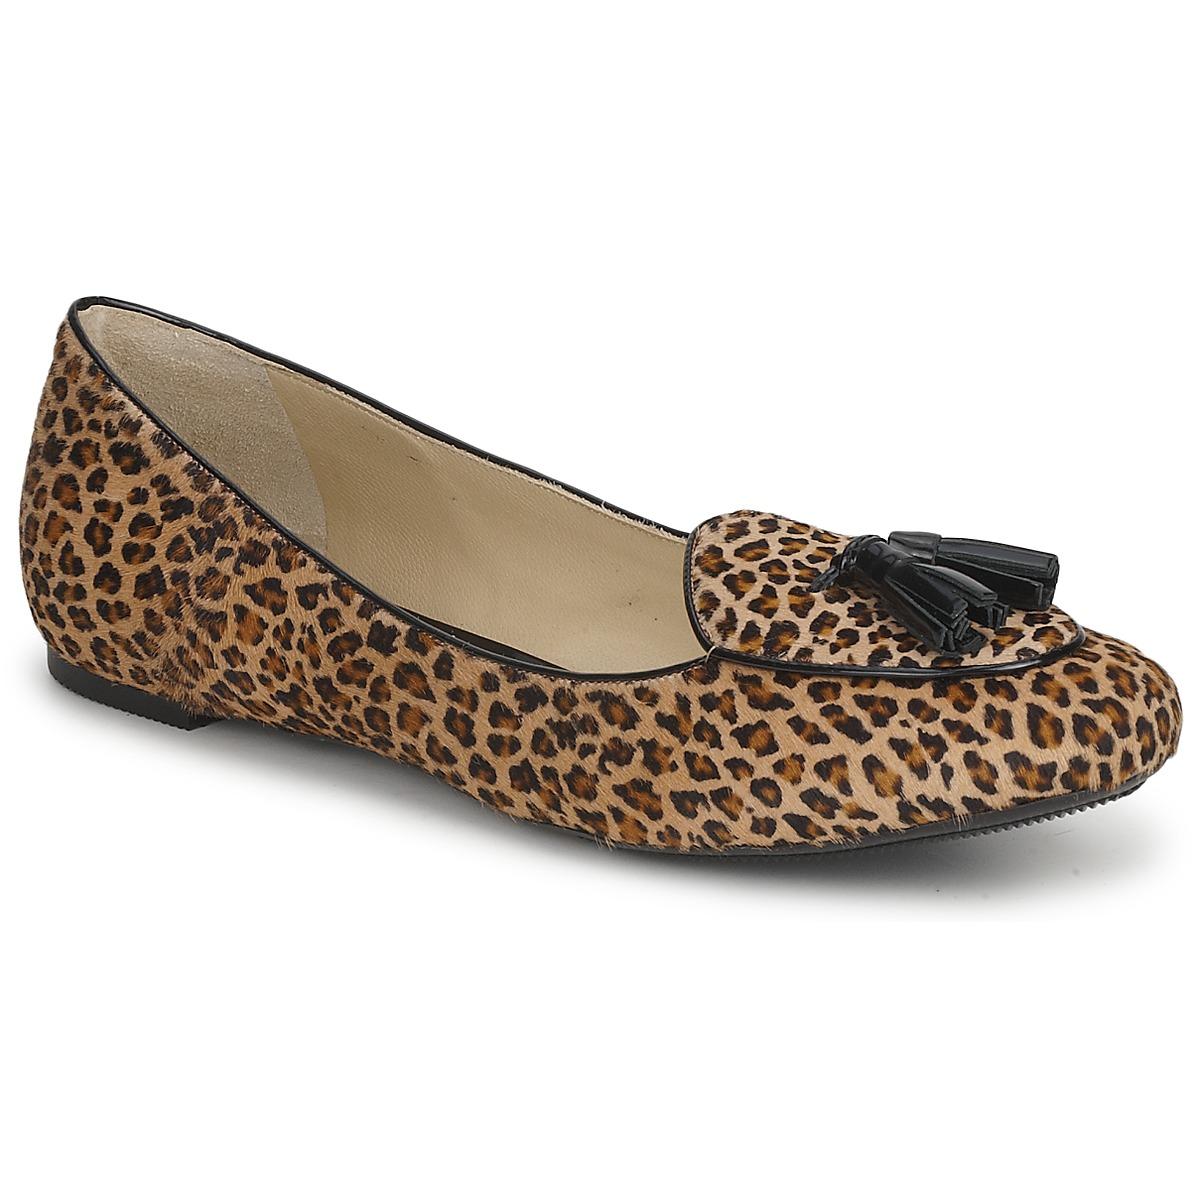 Smart-shoes Etro EDDA Black / Brown / BEIGE